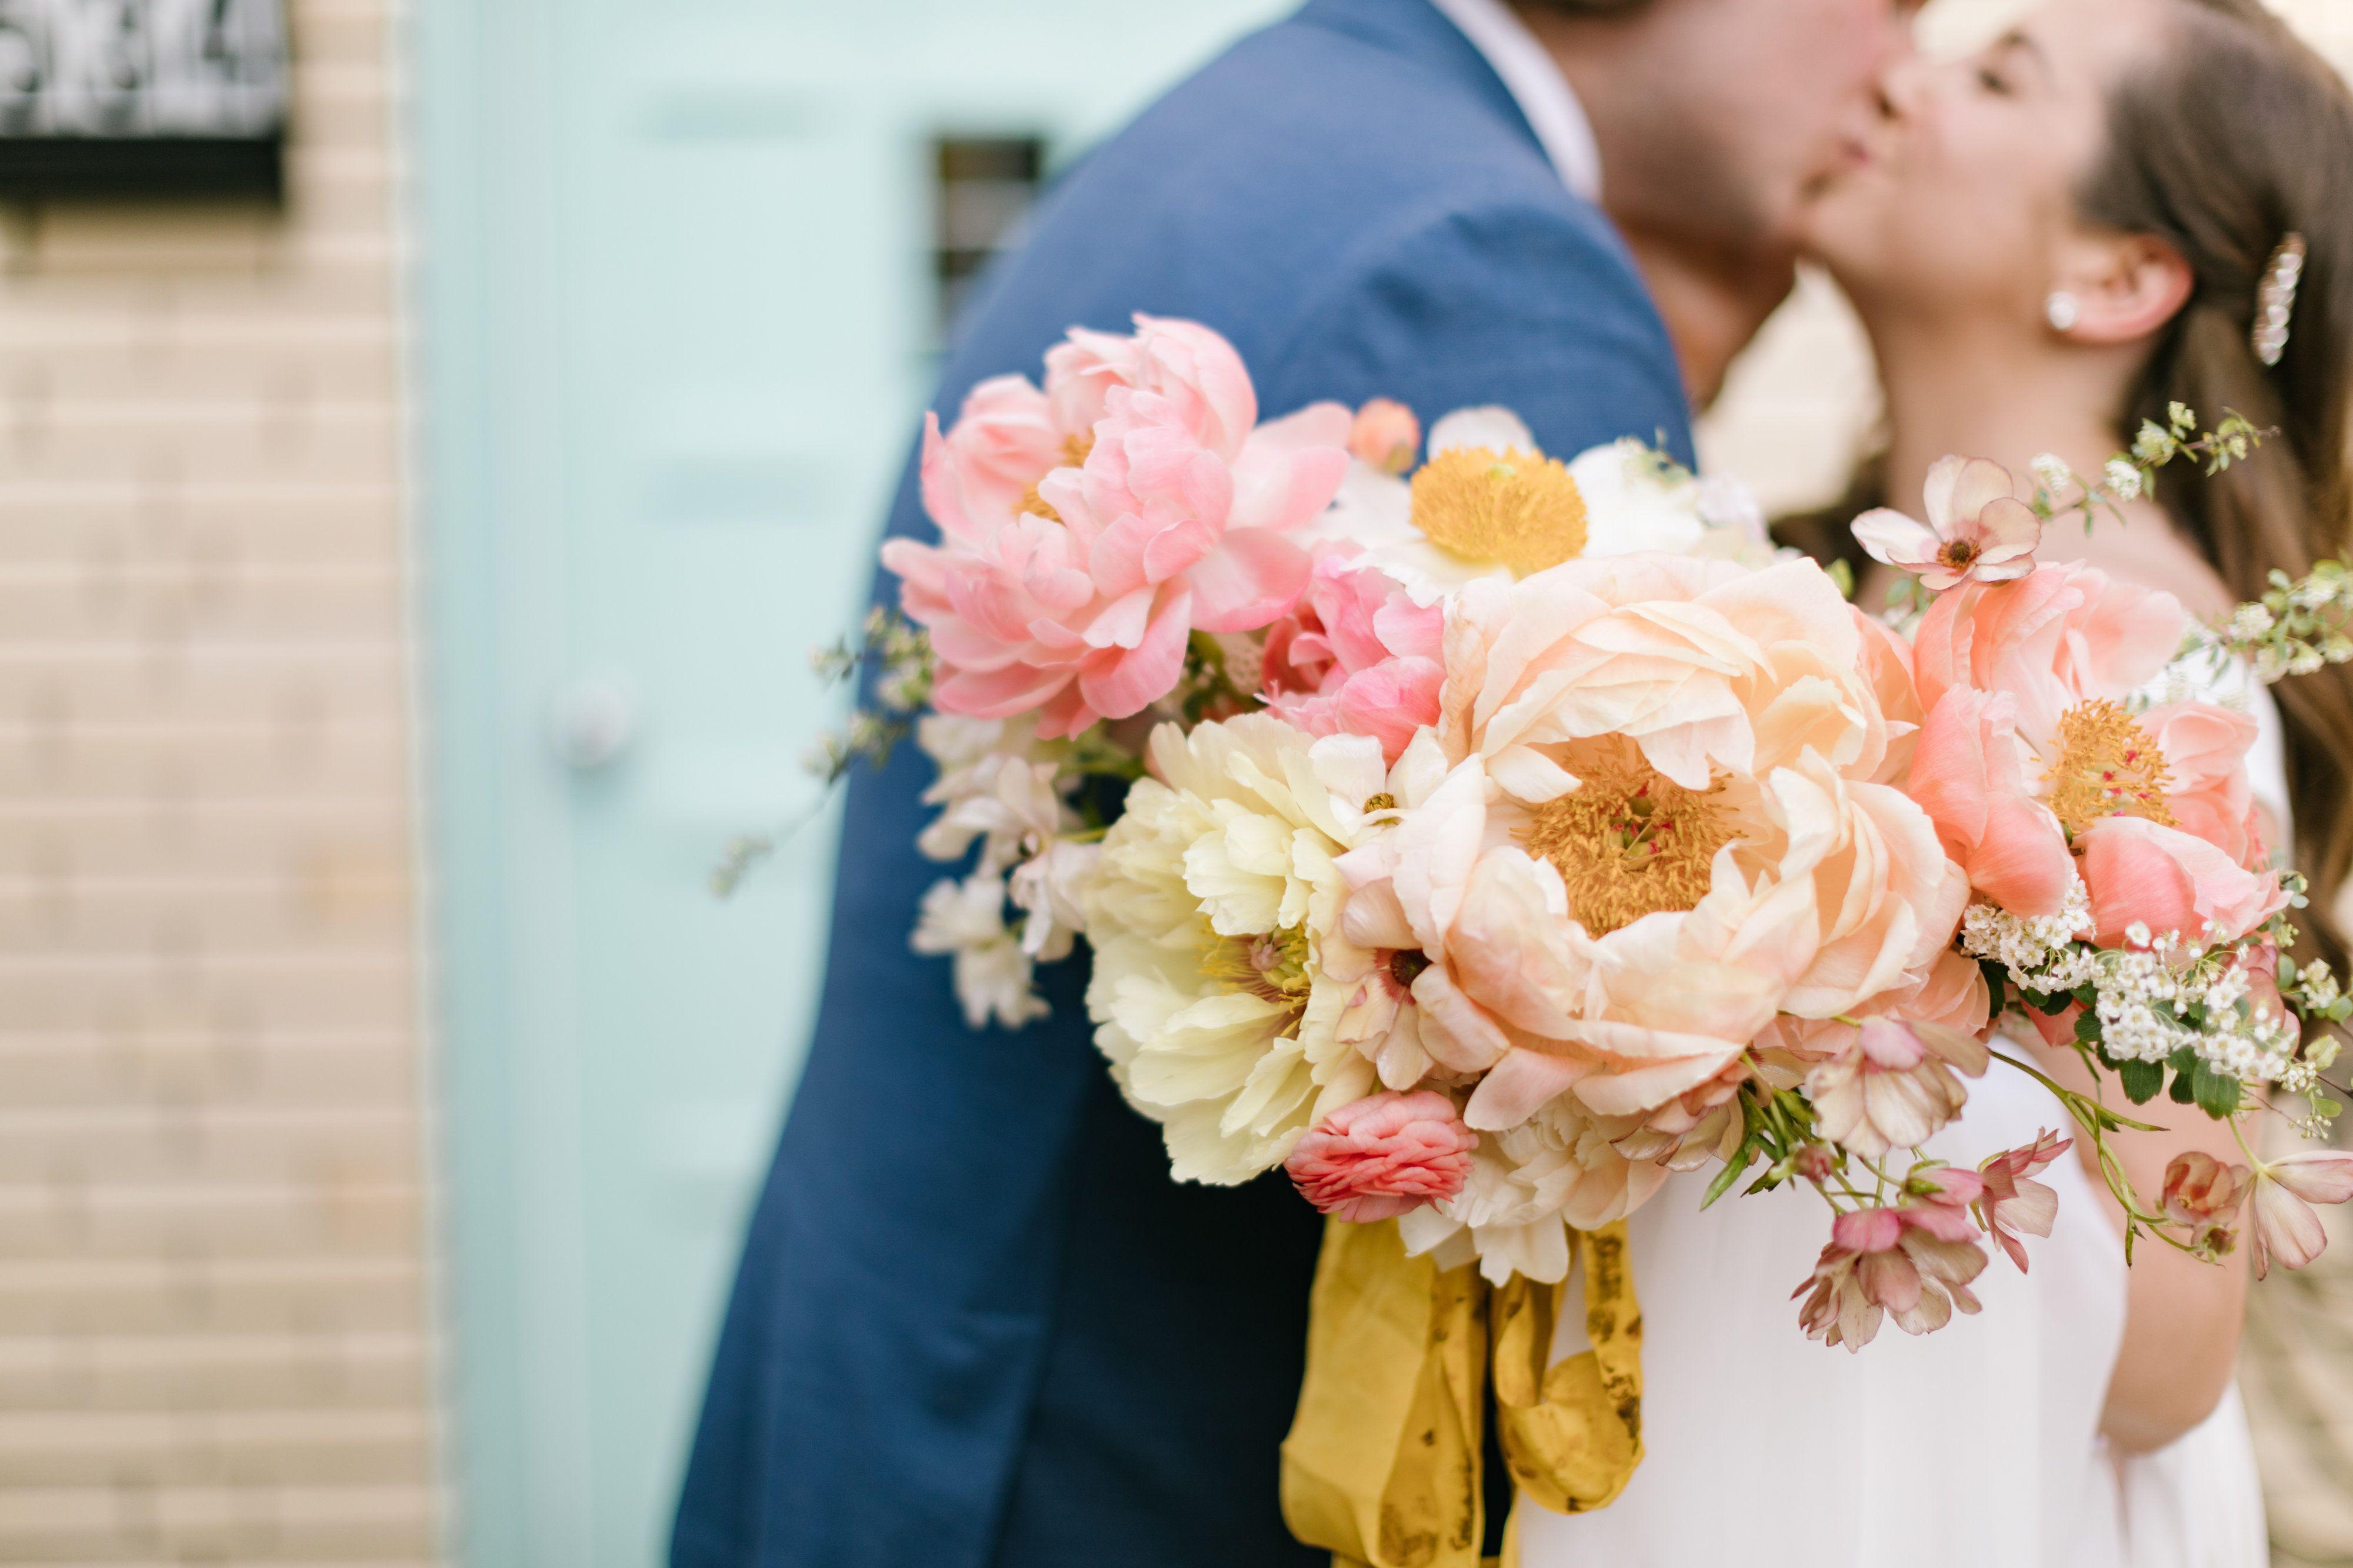 Bouquet Downtown Wedding Wedding Event Planning Wedding Coordinator